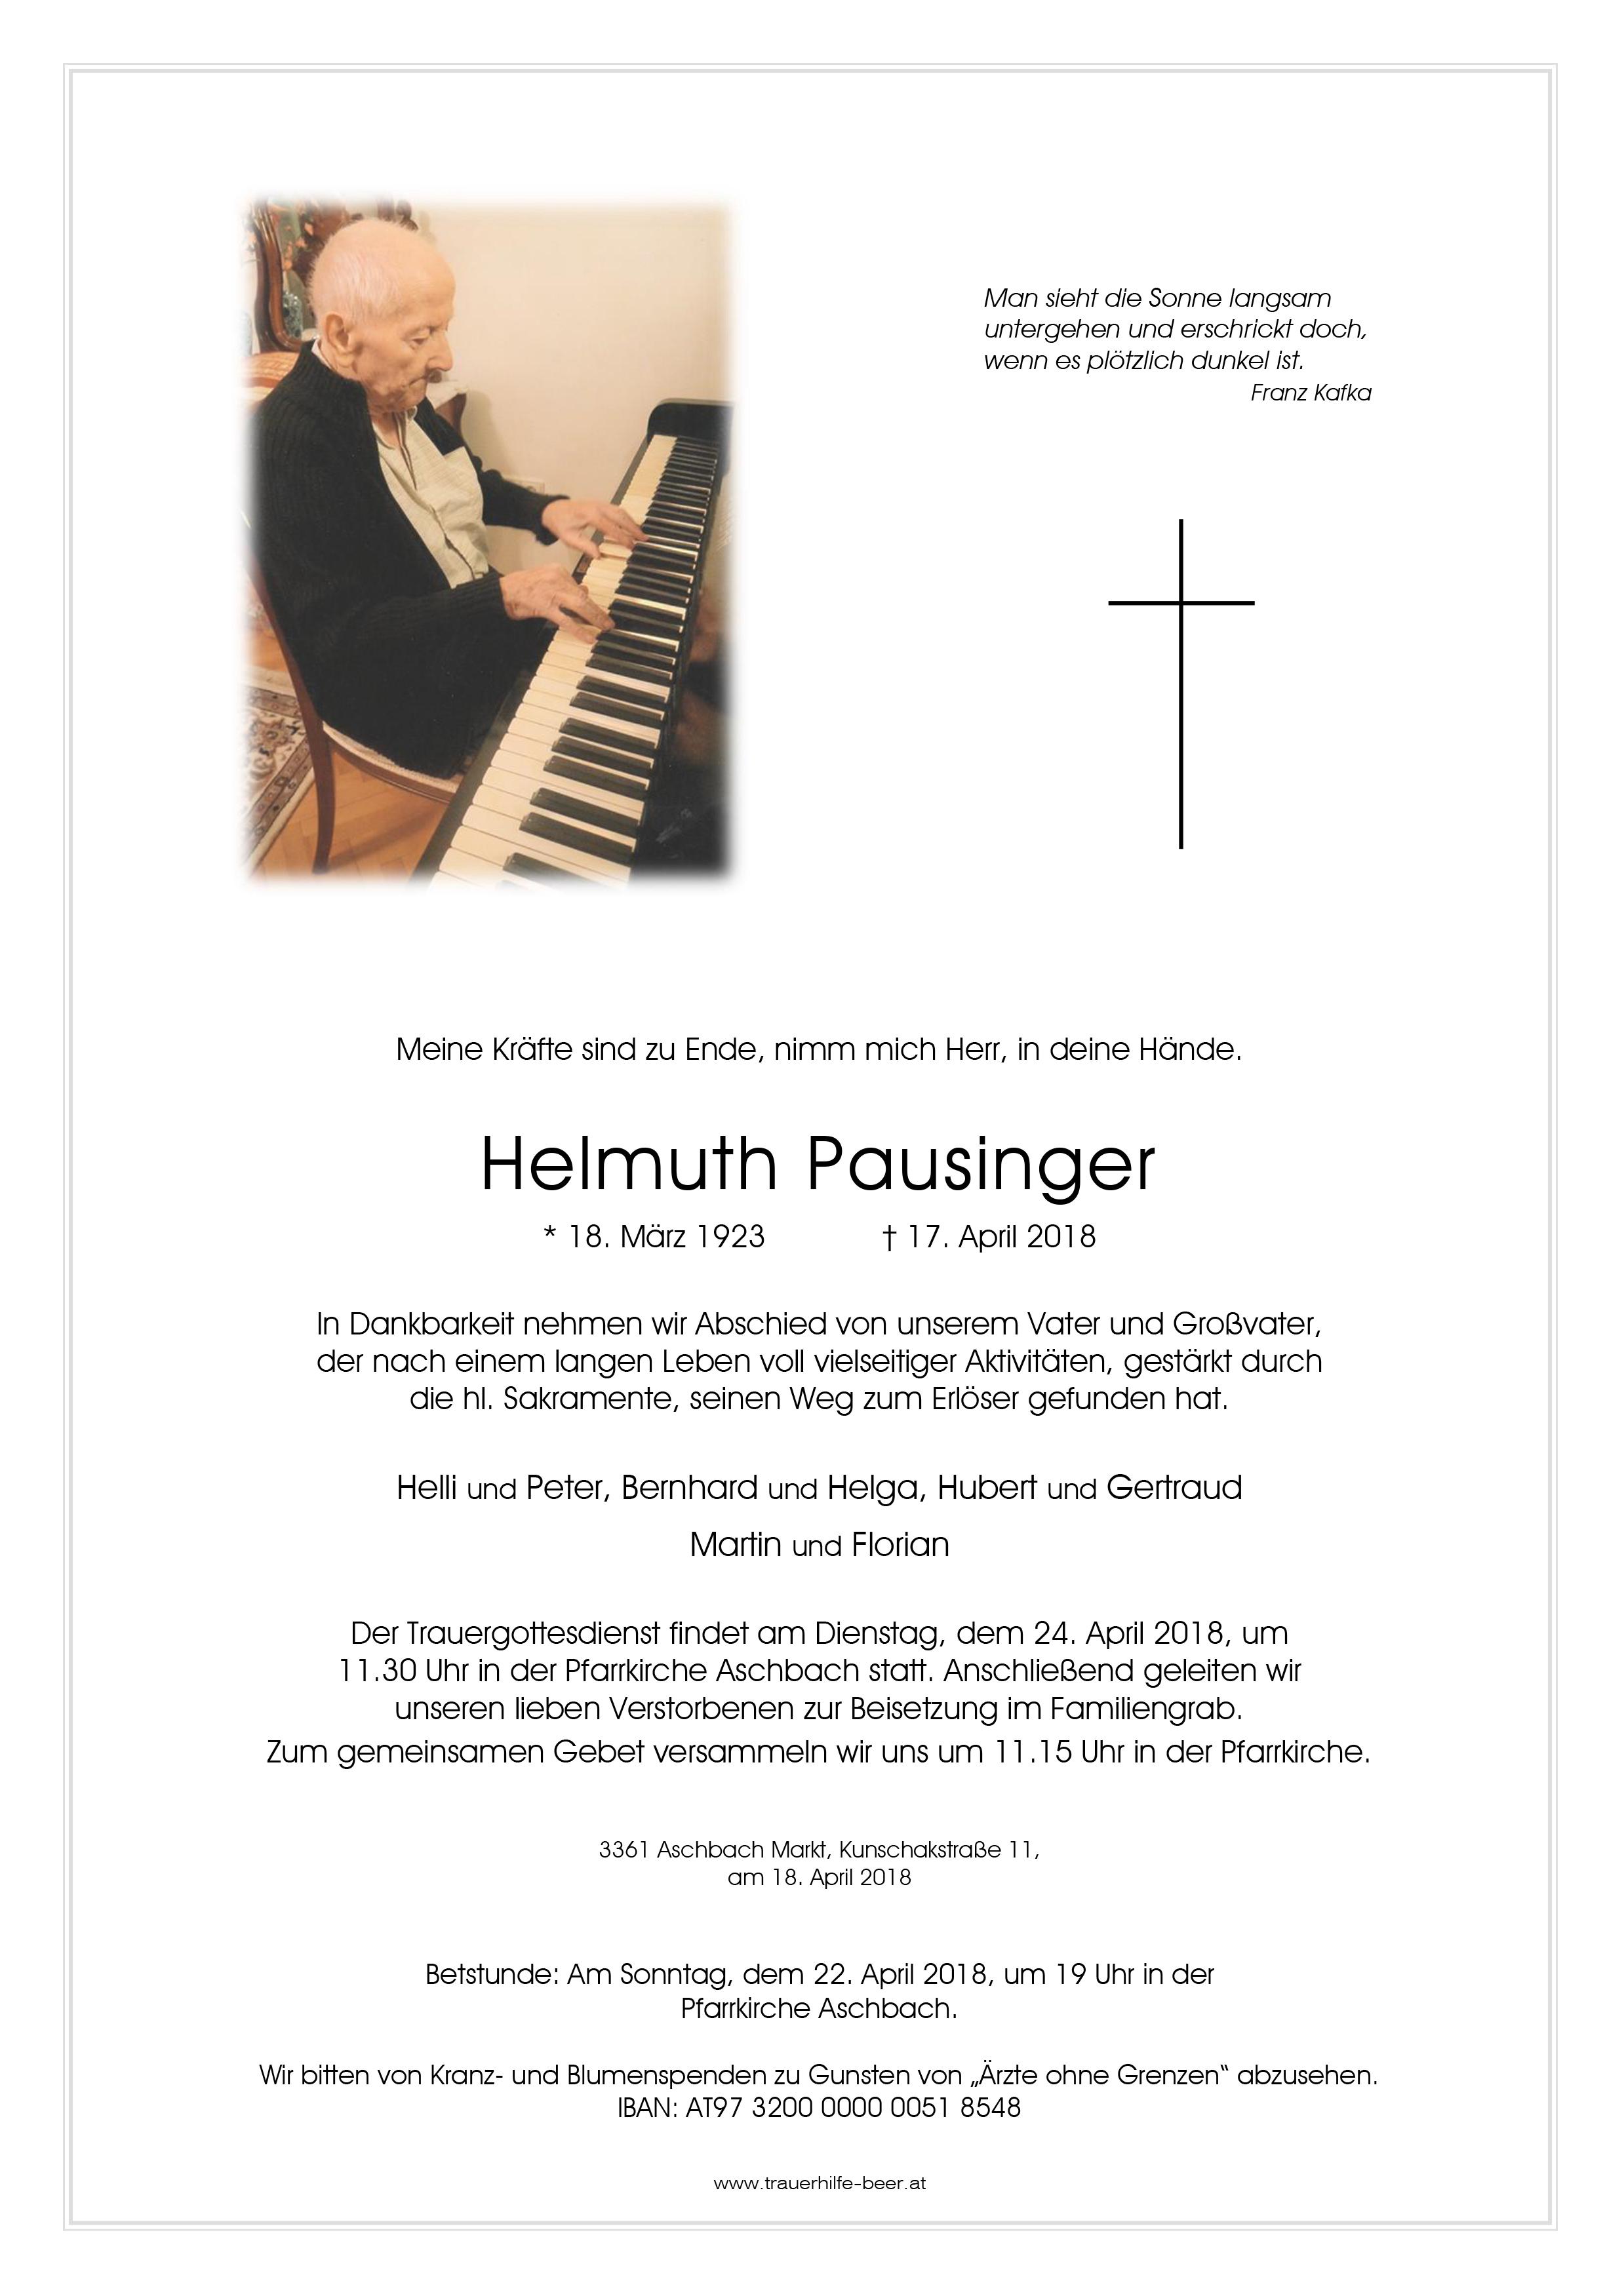 Helmuth Pausinger